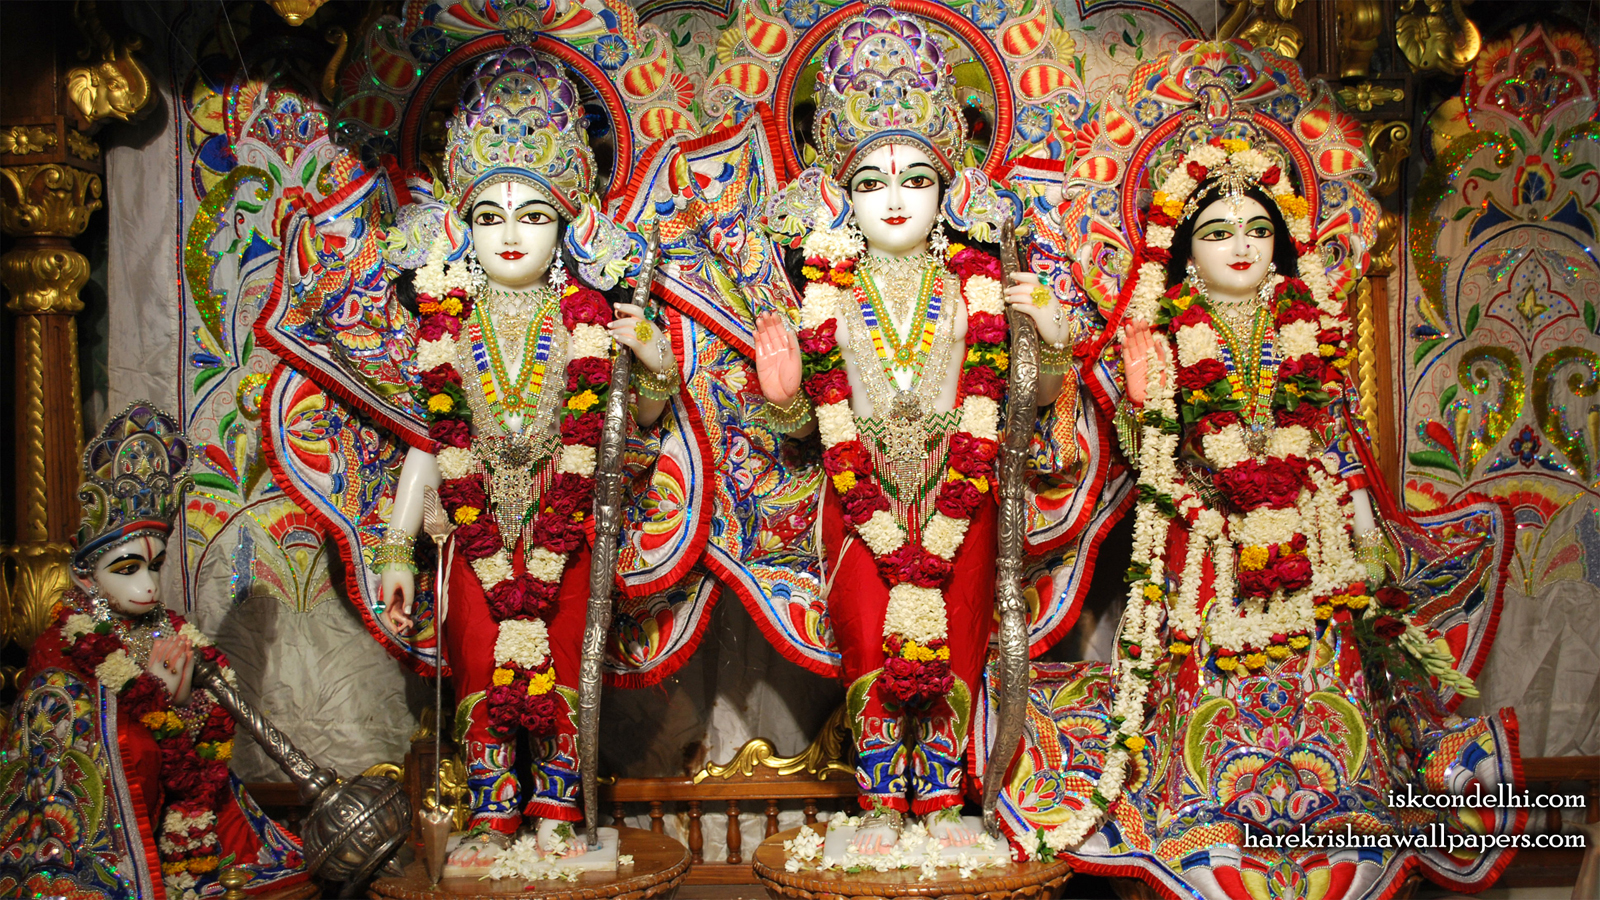 Sri Sri Sita Rama Laxman Hanuman Wallpaper (009) Size 1600x900 Download